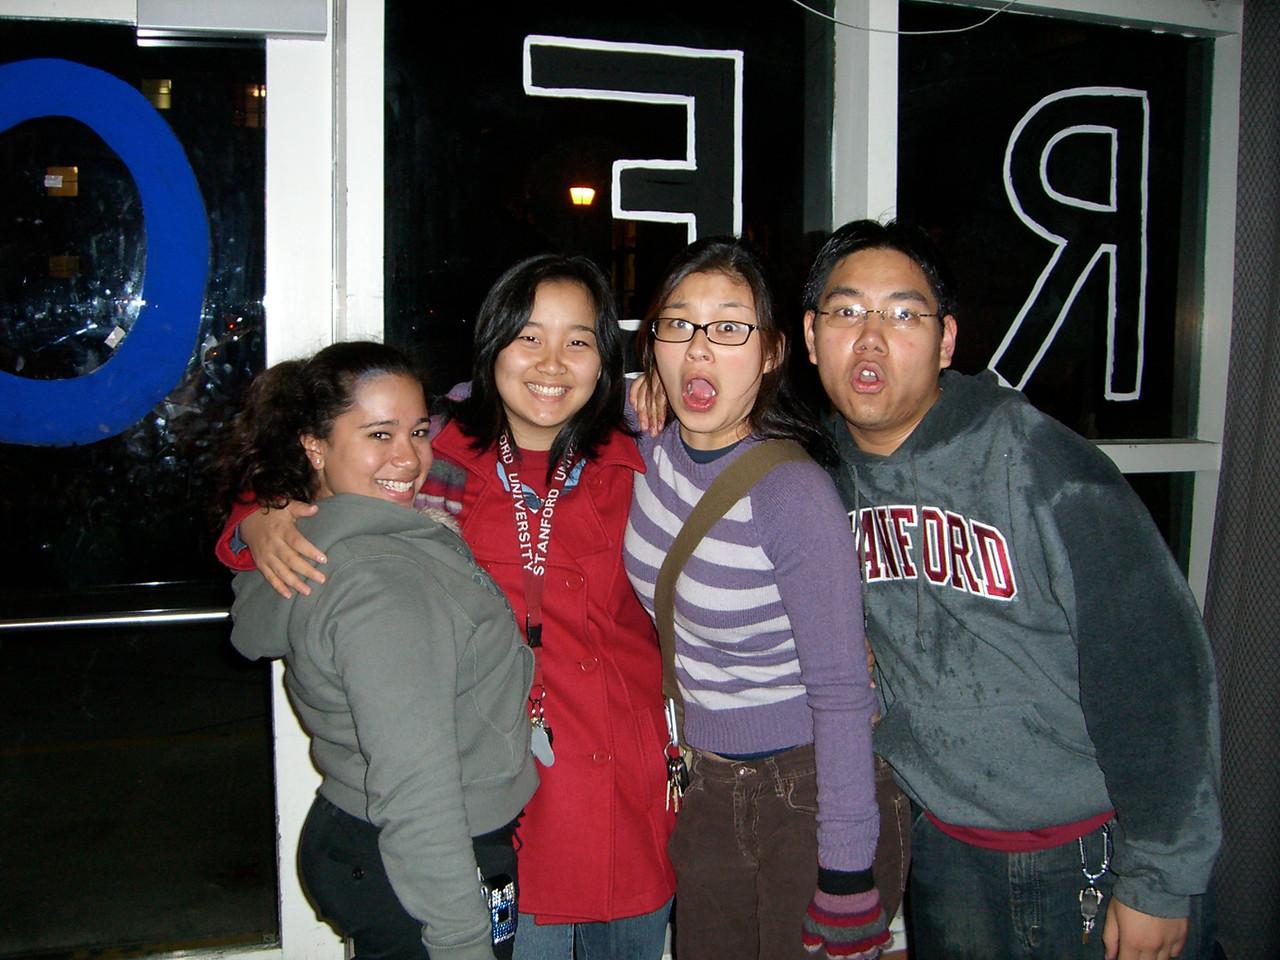 2006 03 01 Wed - David Chiang's B-day - Jennifer Evans, Esther Kang, Jenn Kim, & David Chiang